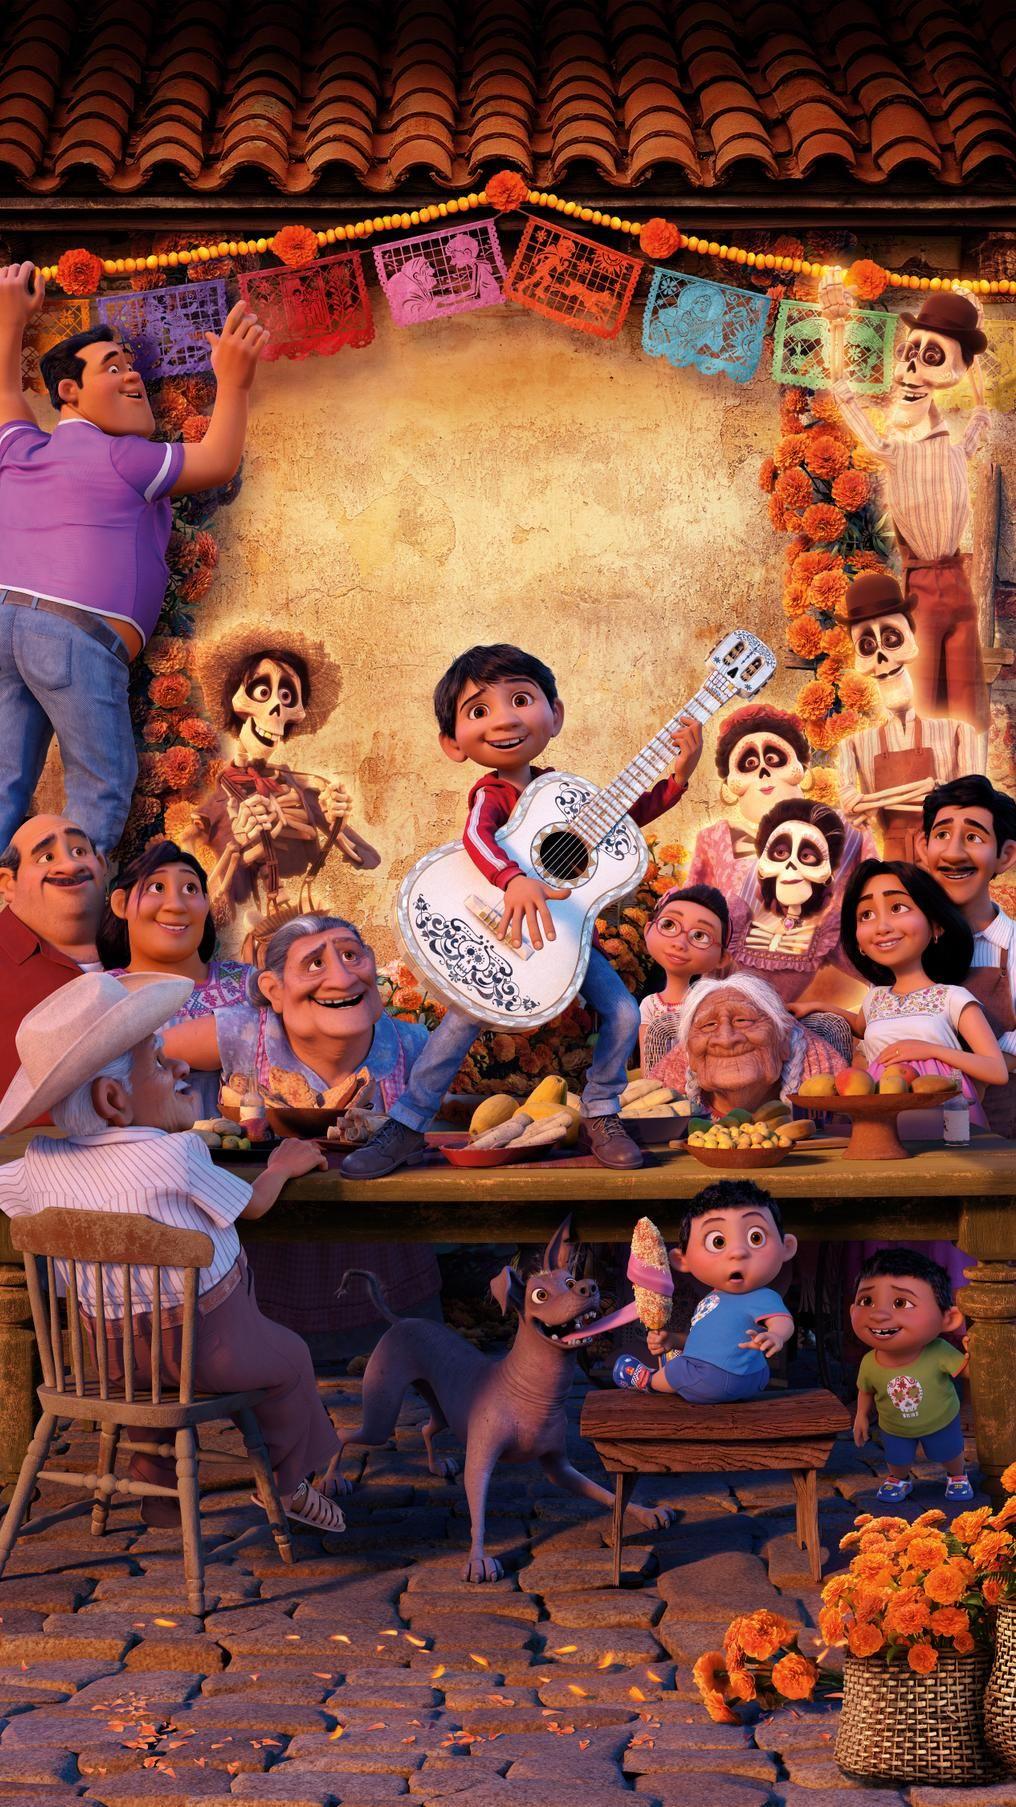 Coco (2017) Phone Wallpaper | Moviemania